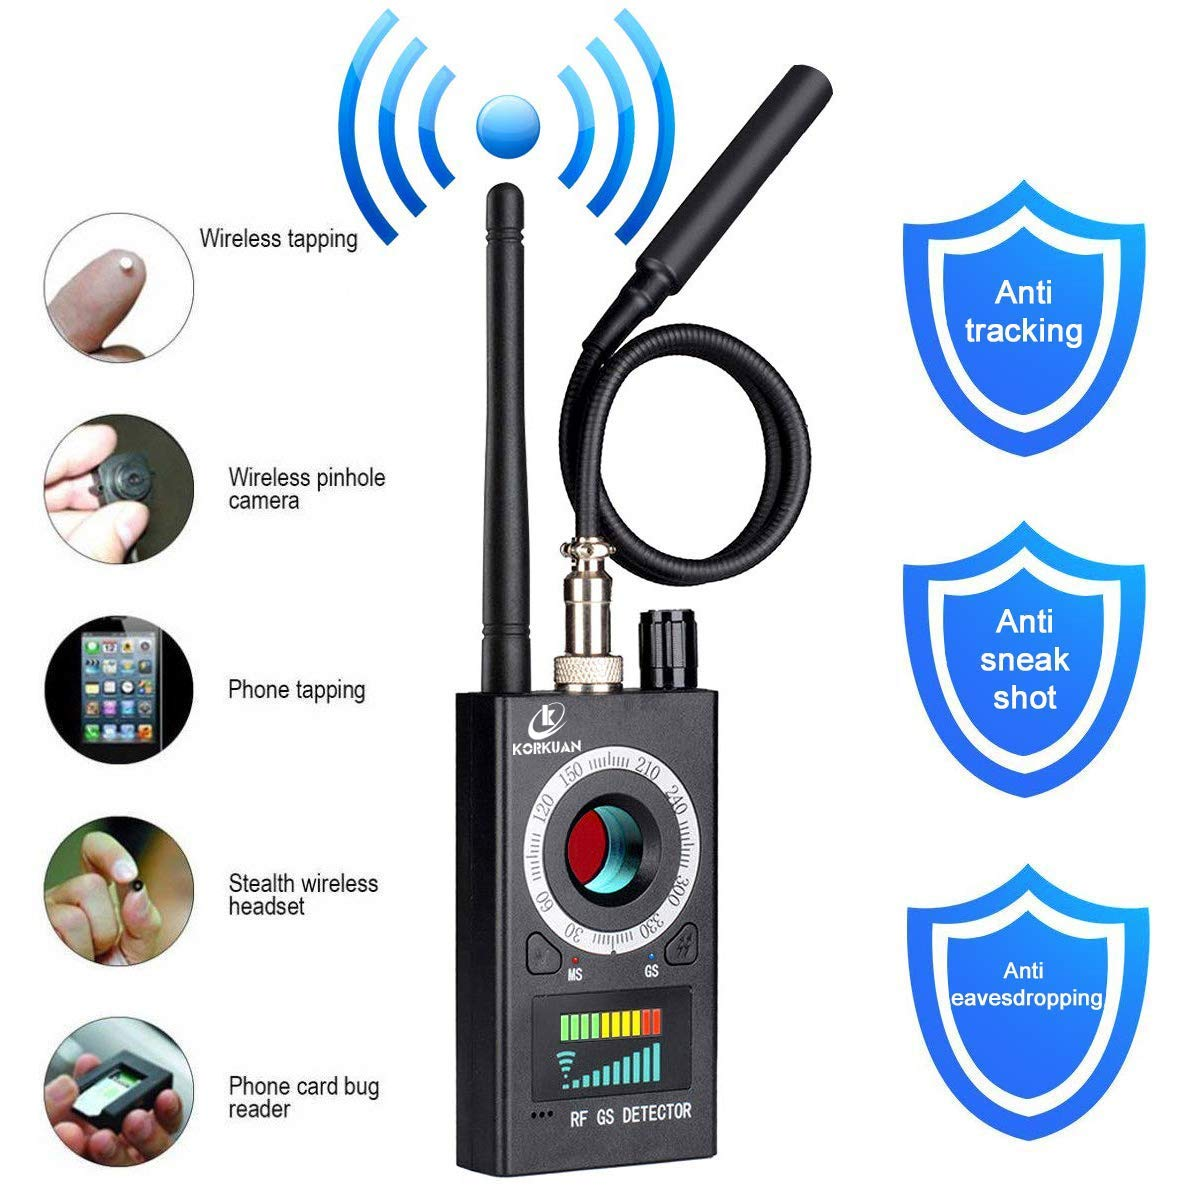 Anti Spy Detector, RF Detector & Camera Finder, Bug Detector, Upgraded RF Signal Detector, KORKUAN GSM Tracking Device for Wireless Audio Bug Hidden Camera Detector by Wattne